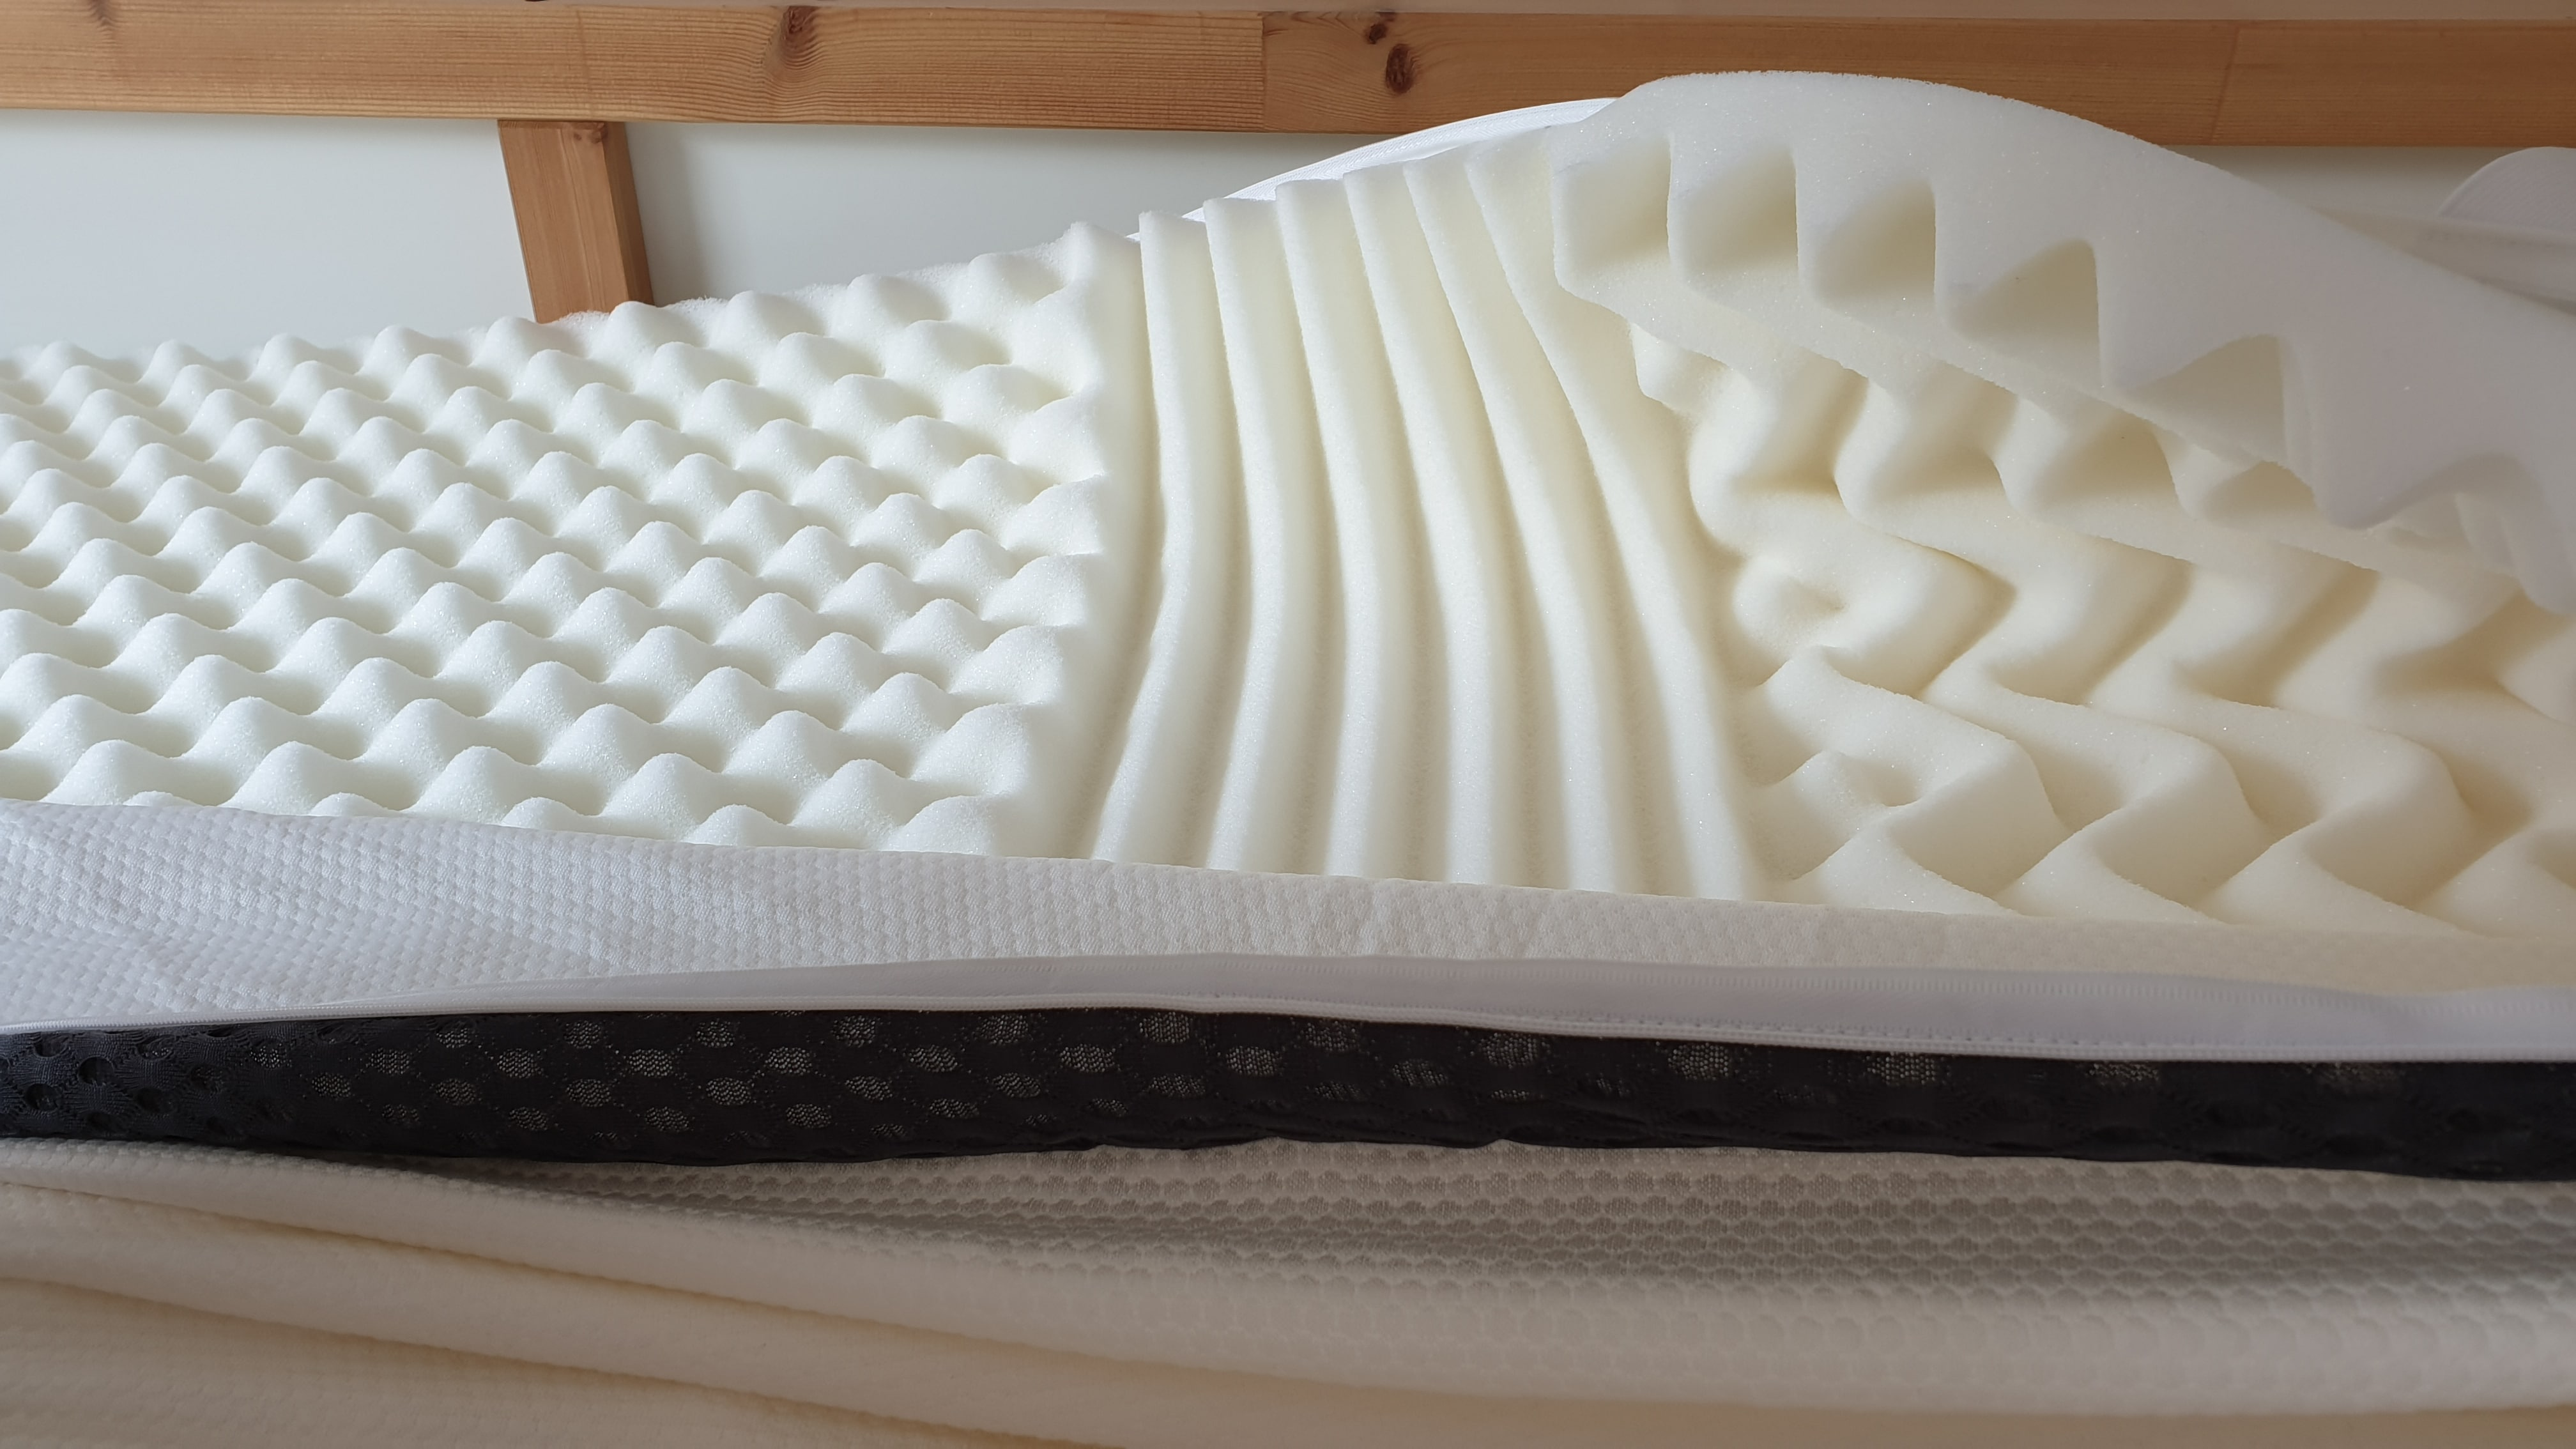 7 zone Amazon mattress topper